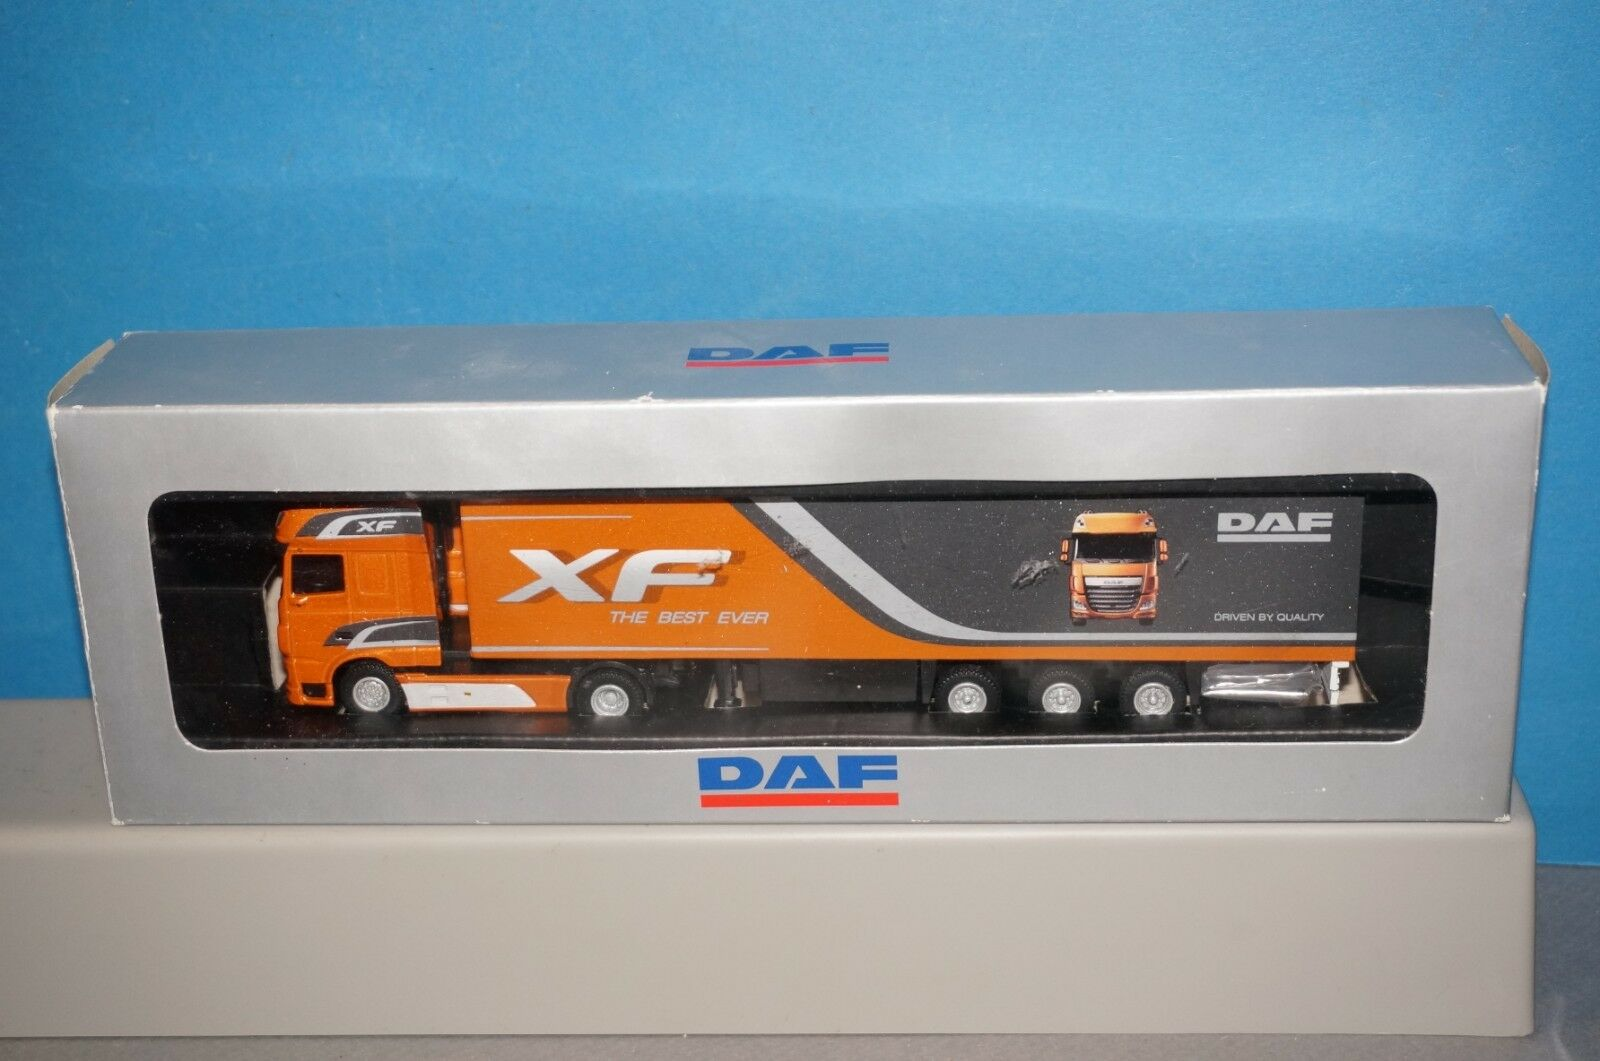 Rf40] WSI Models-daf xf super space cab 4x2+box Caravane - 3 AXLE foire modèle-neuf dans sa boîte